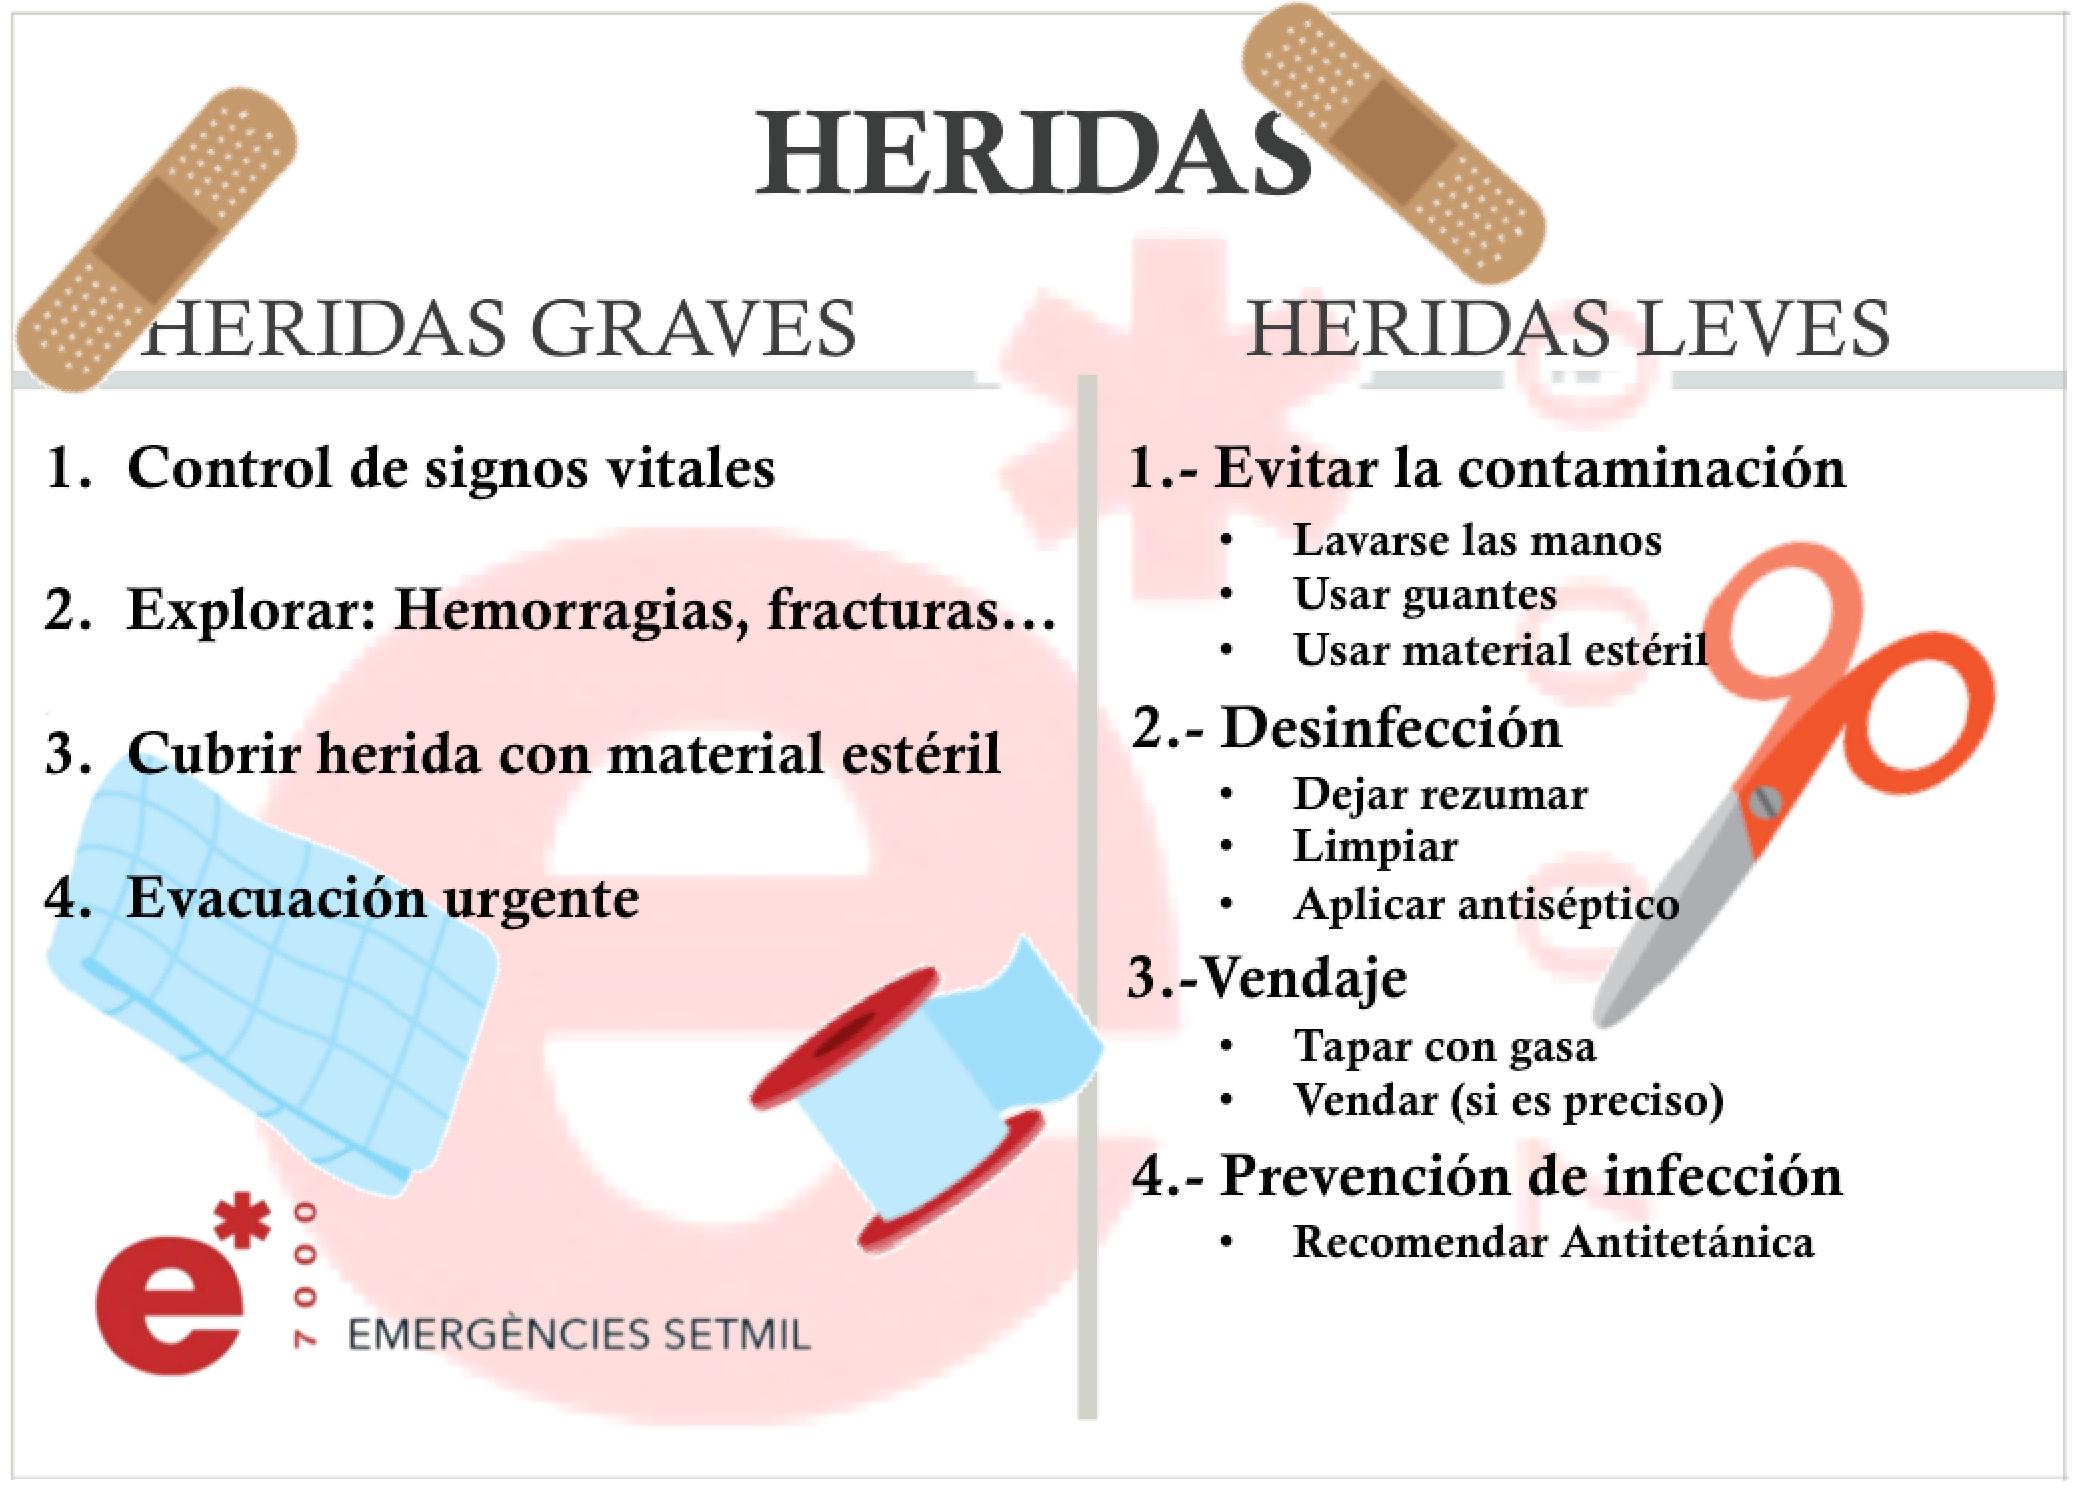 Resultado de imagen para curacion de heridas infografia